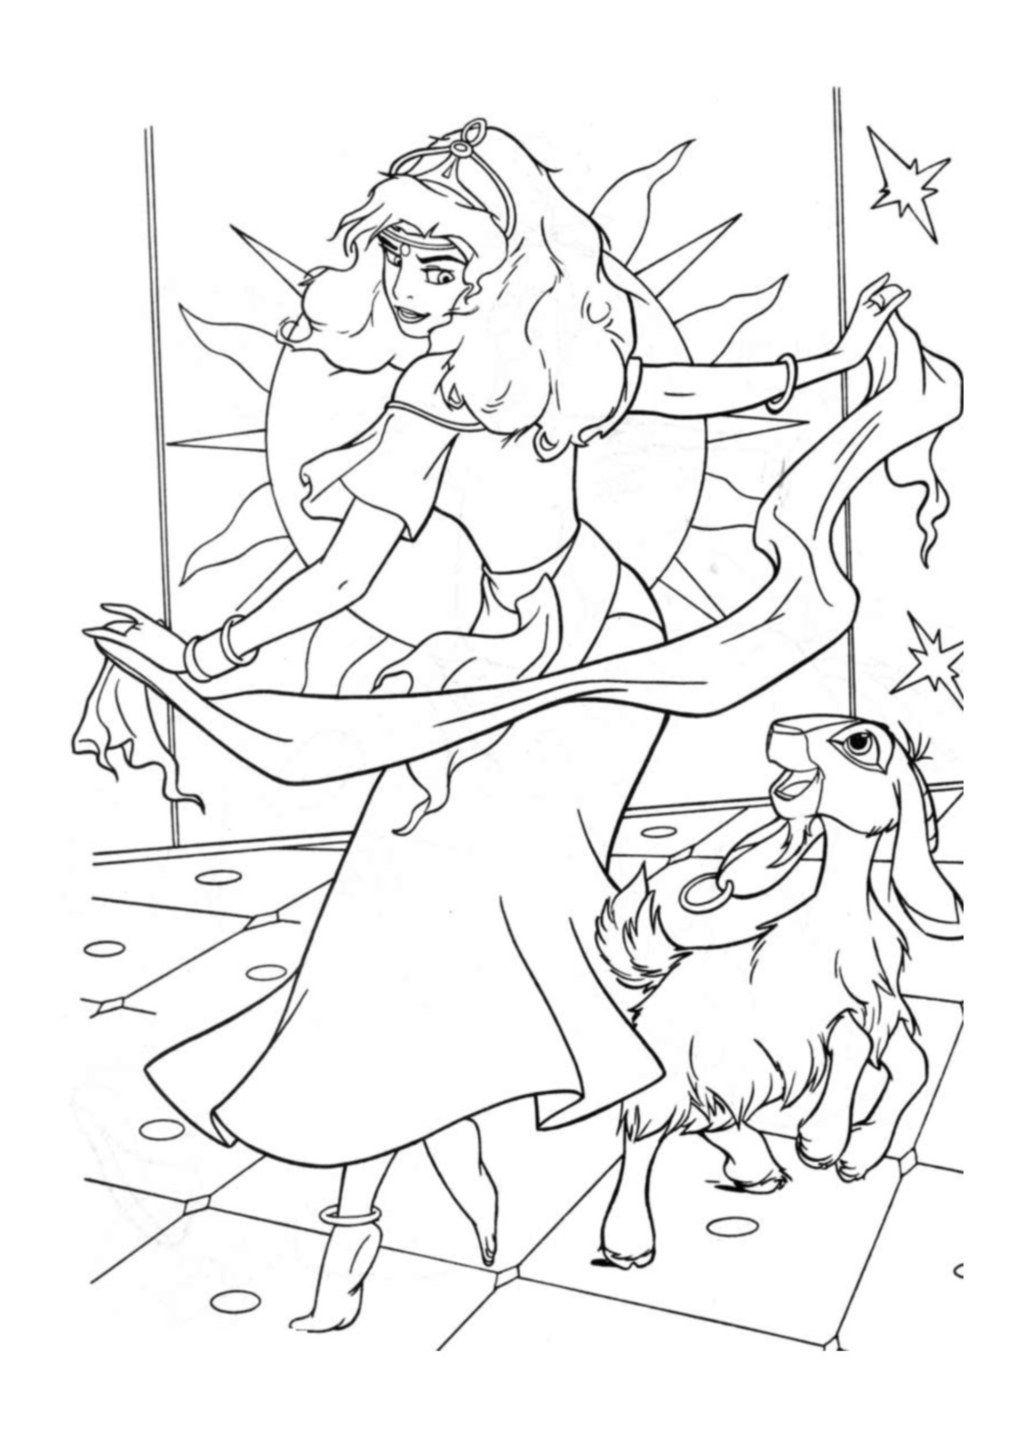 Esmeralda Her Goat Djali Coloring Page Disney Non Disney